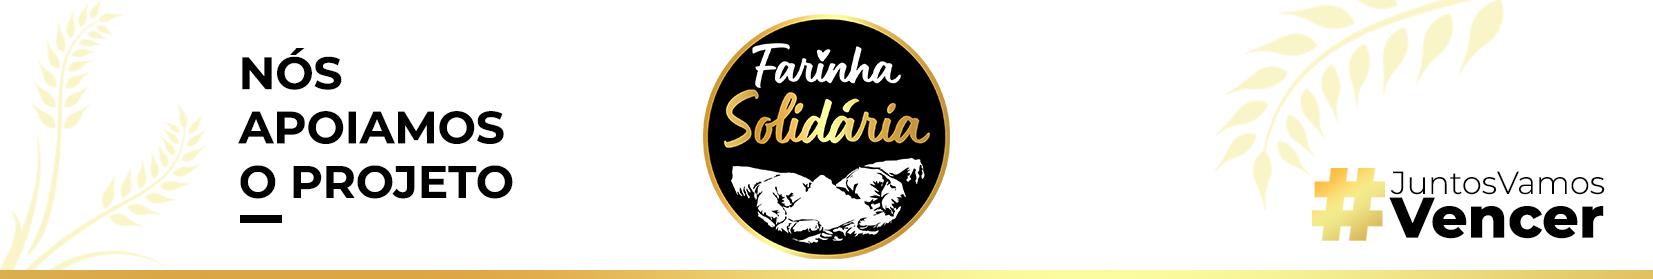 Farinha Solidaria